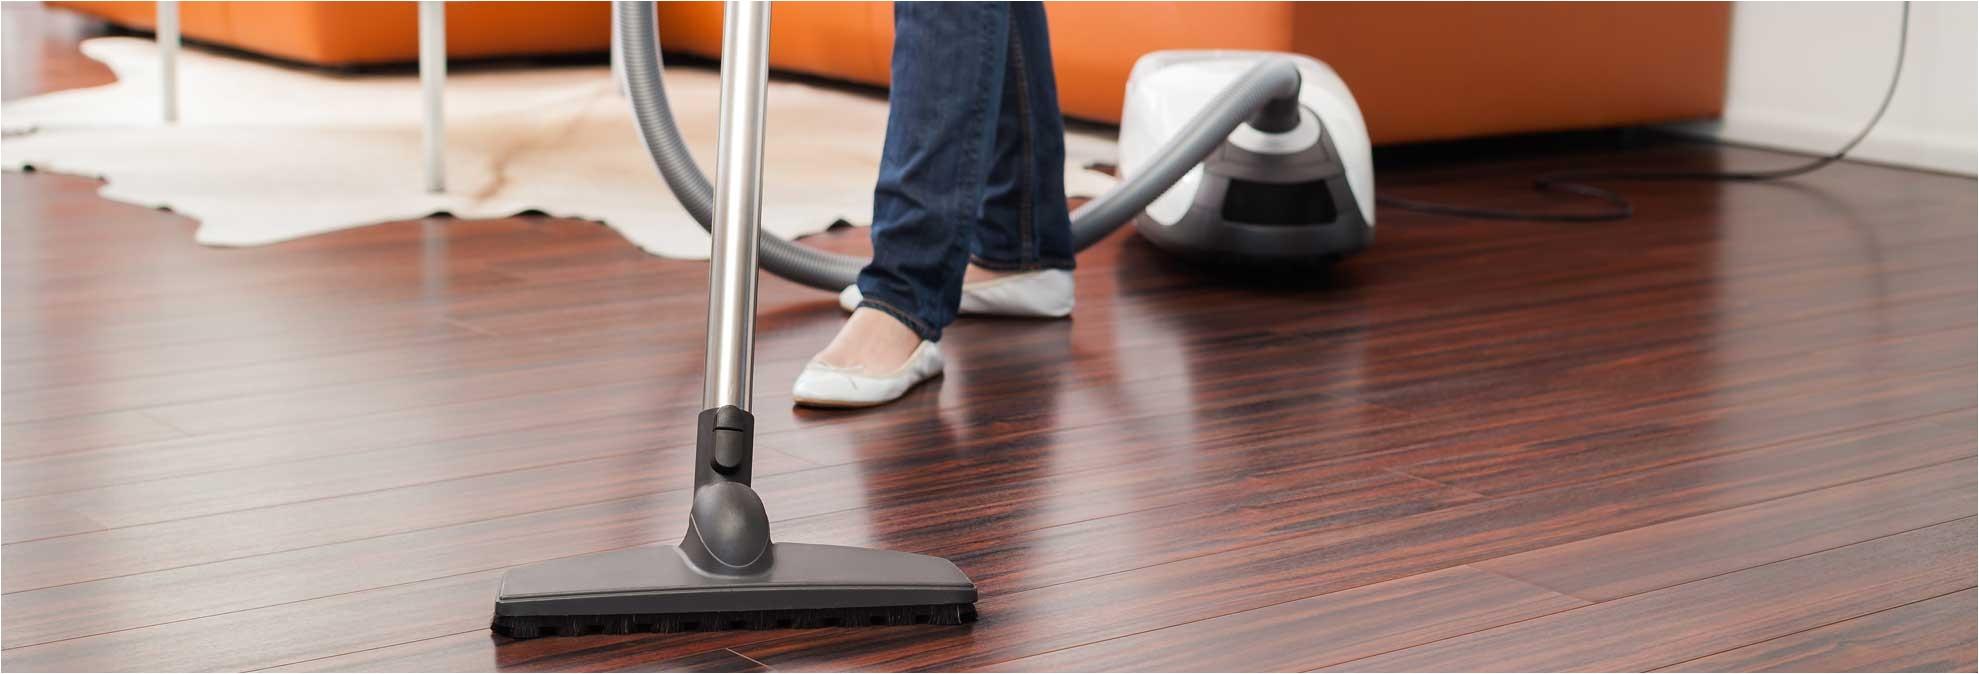 Best Vacuum for Pet Hair Wood Floors and Carpet 40 Lovely Best Vacuum for Hardwood Floors and Carpet Consumer